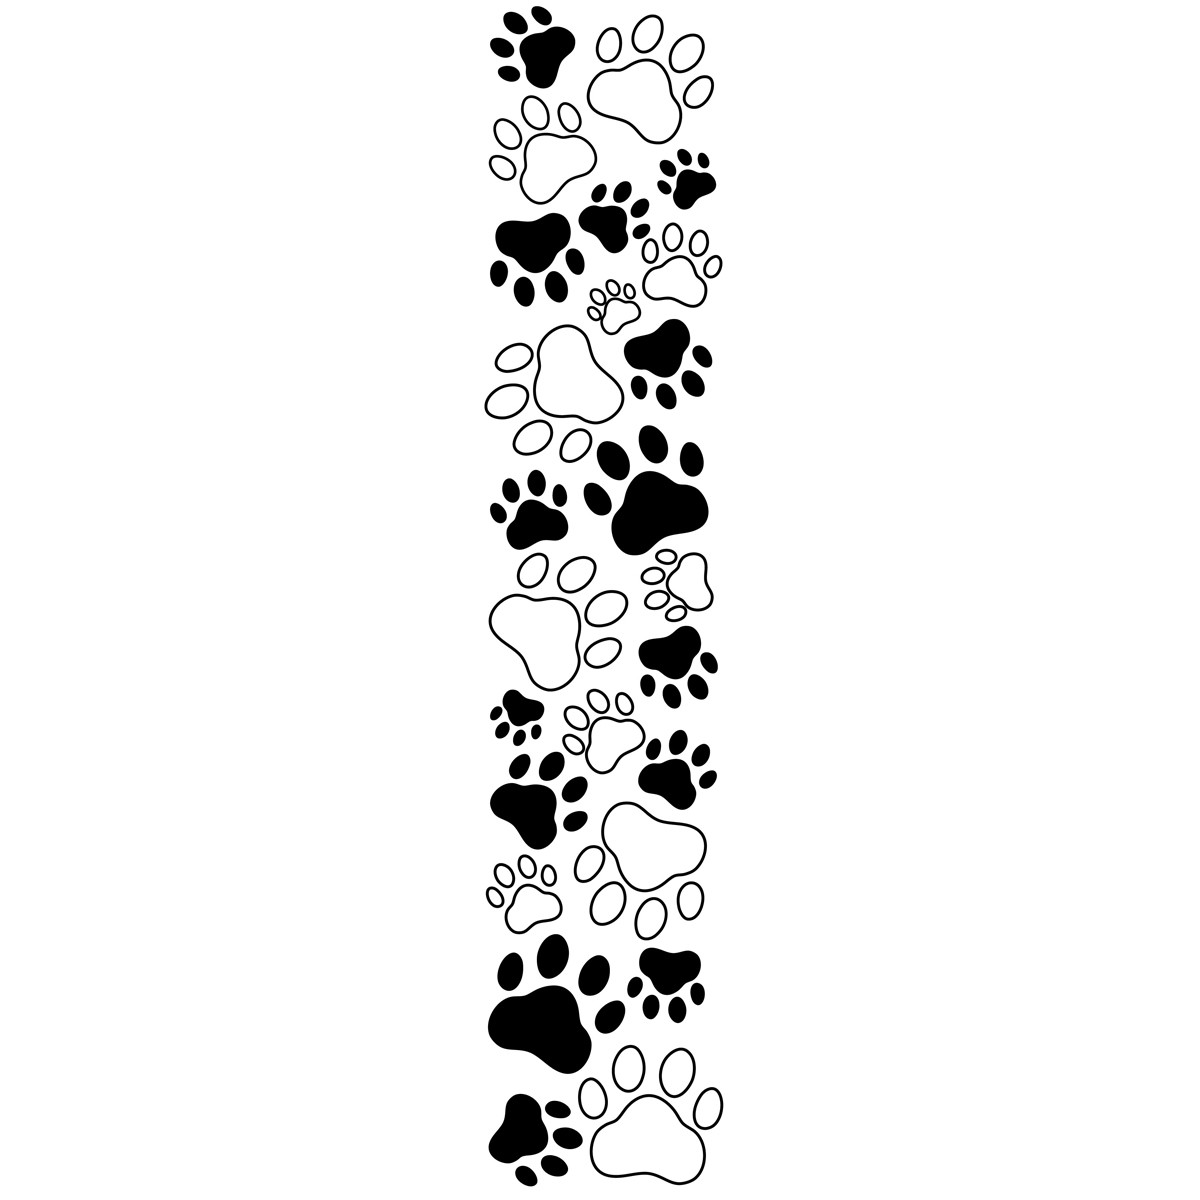 Clip art panda images. Free dog bone border clipart